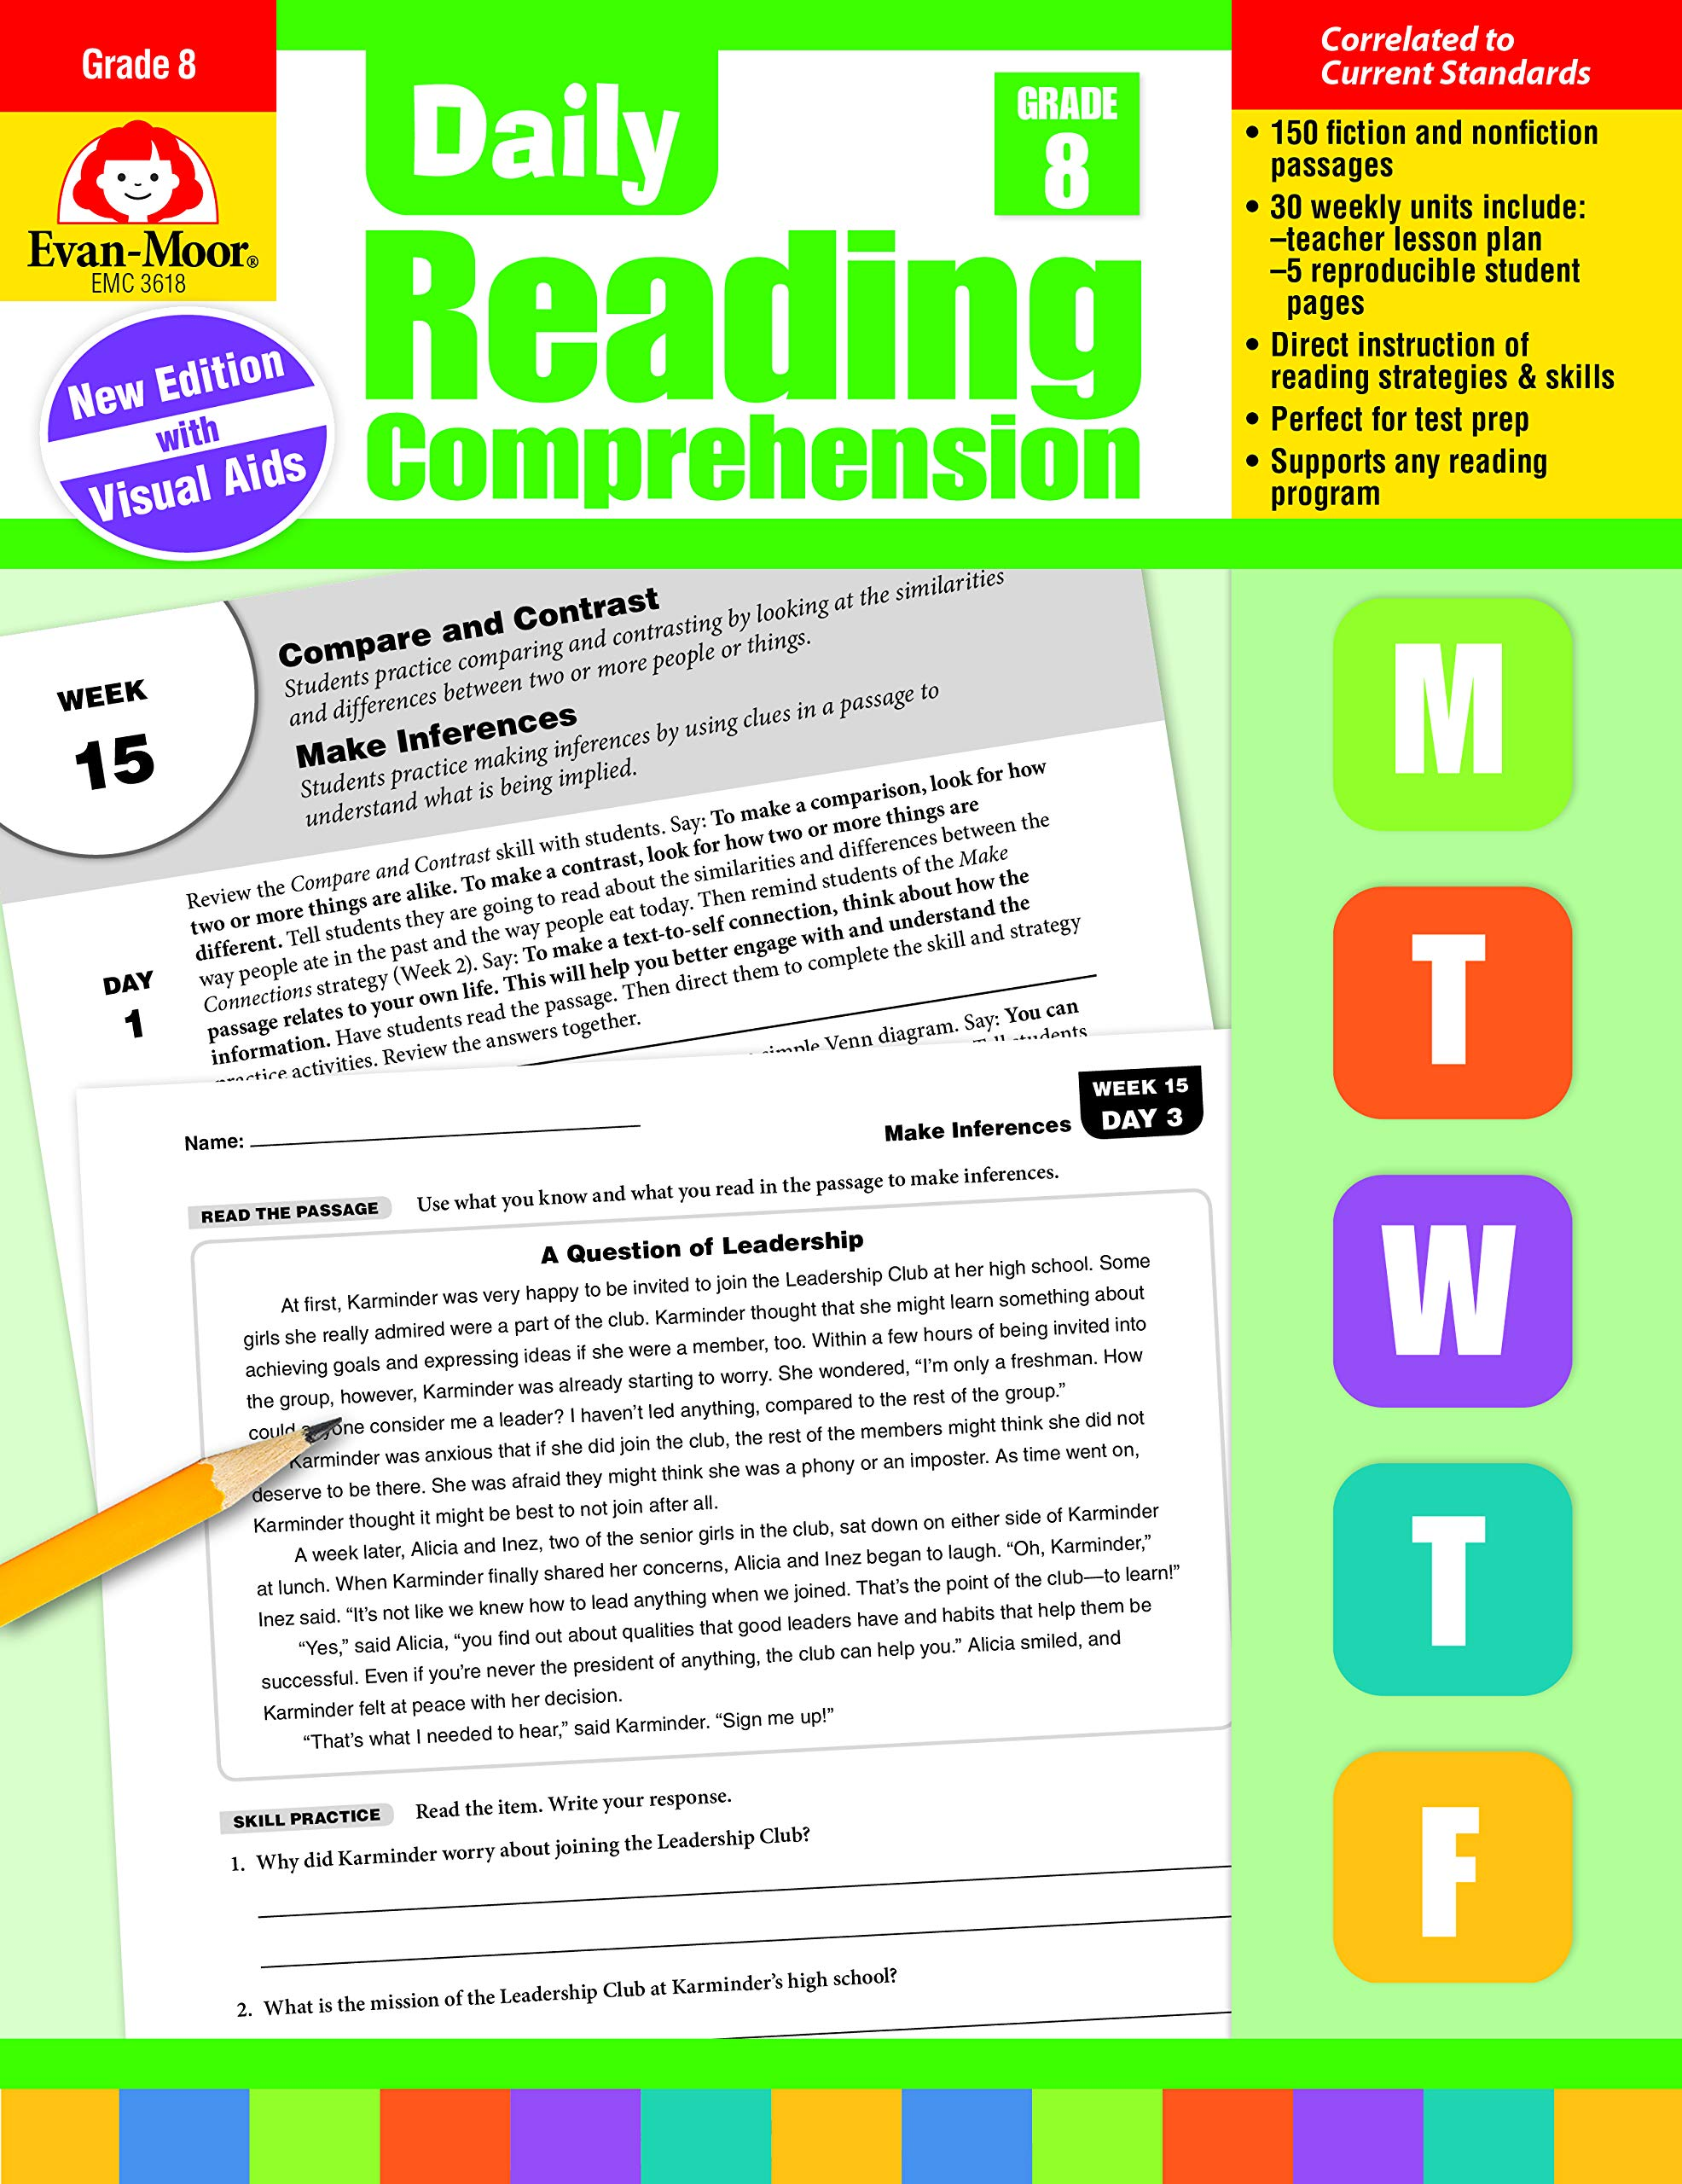 - Amazon.com: Daily Reading Comprehension, Grade 8 (0023472036186